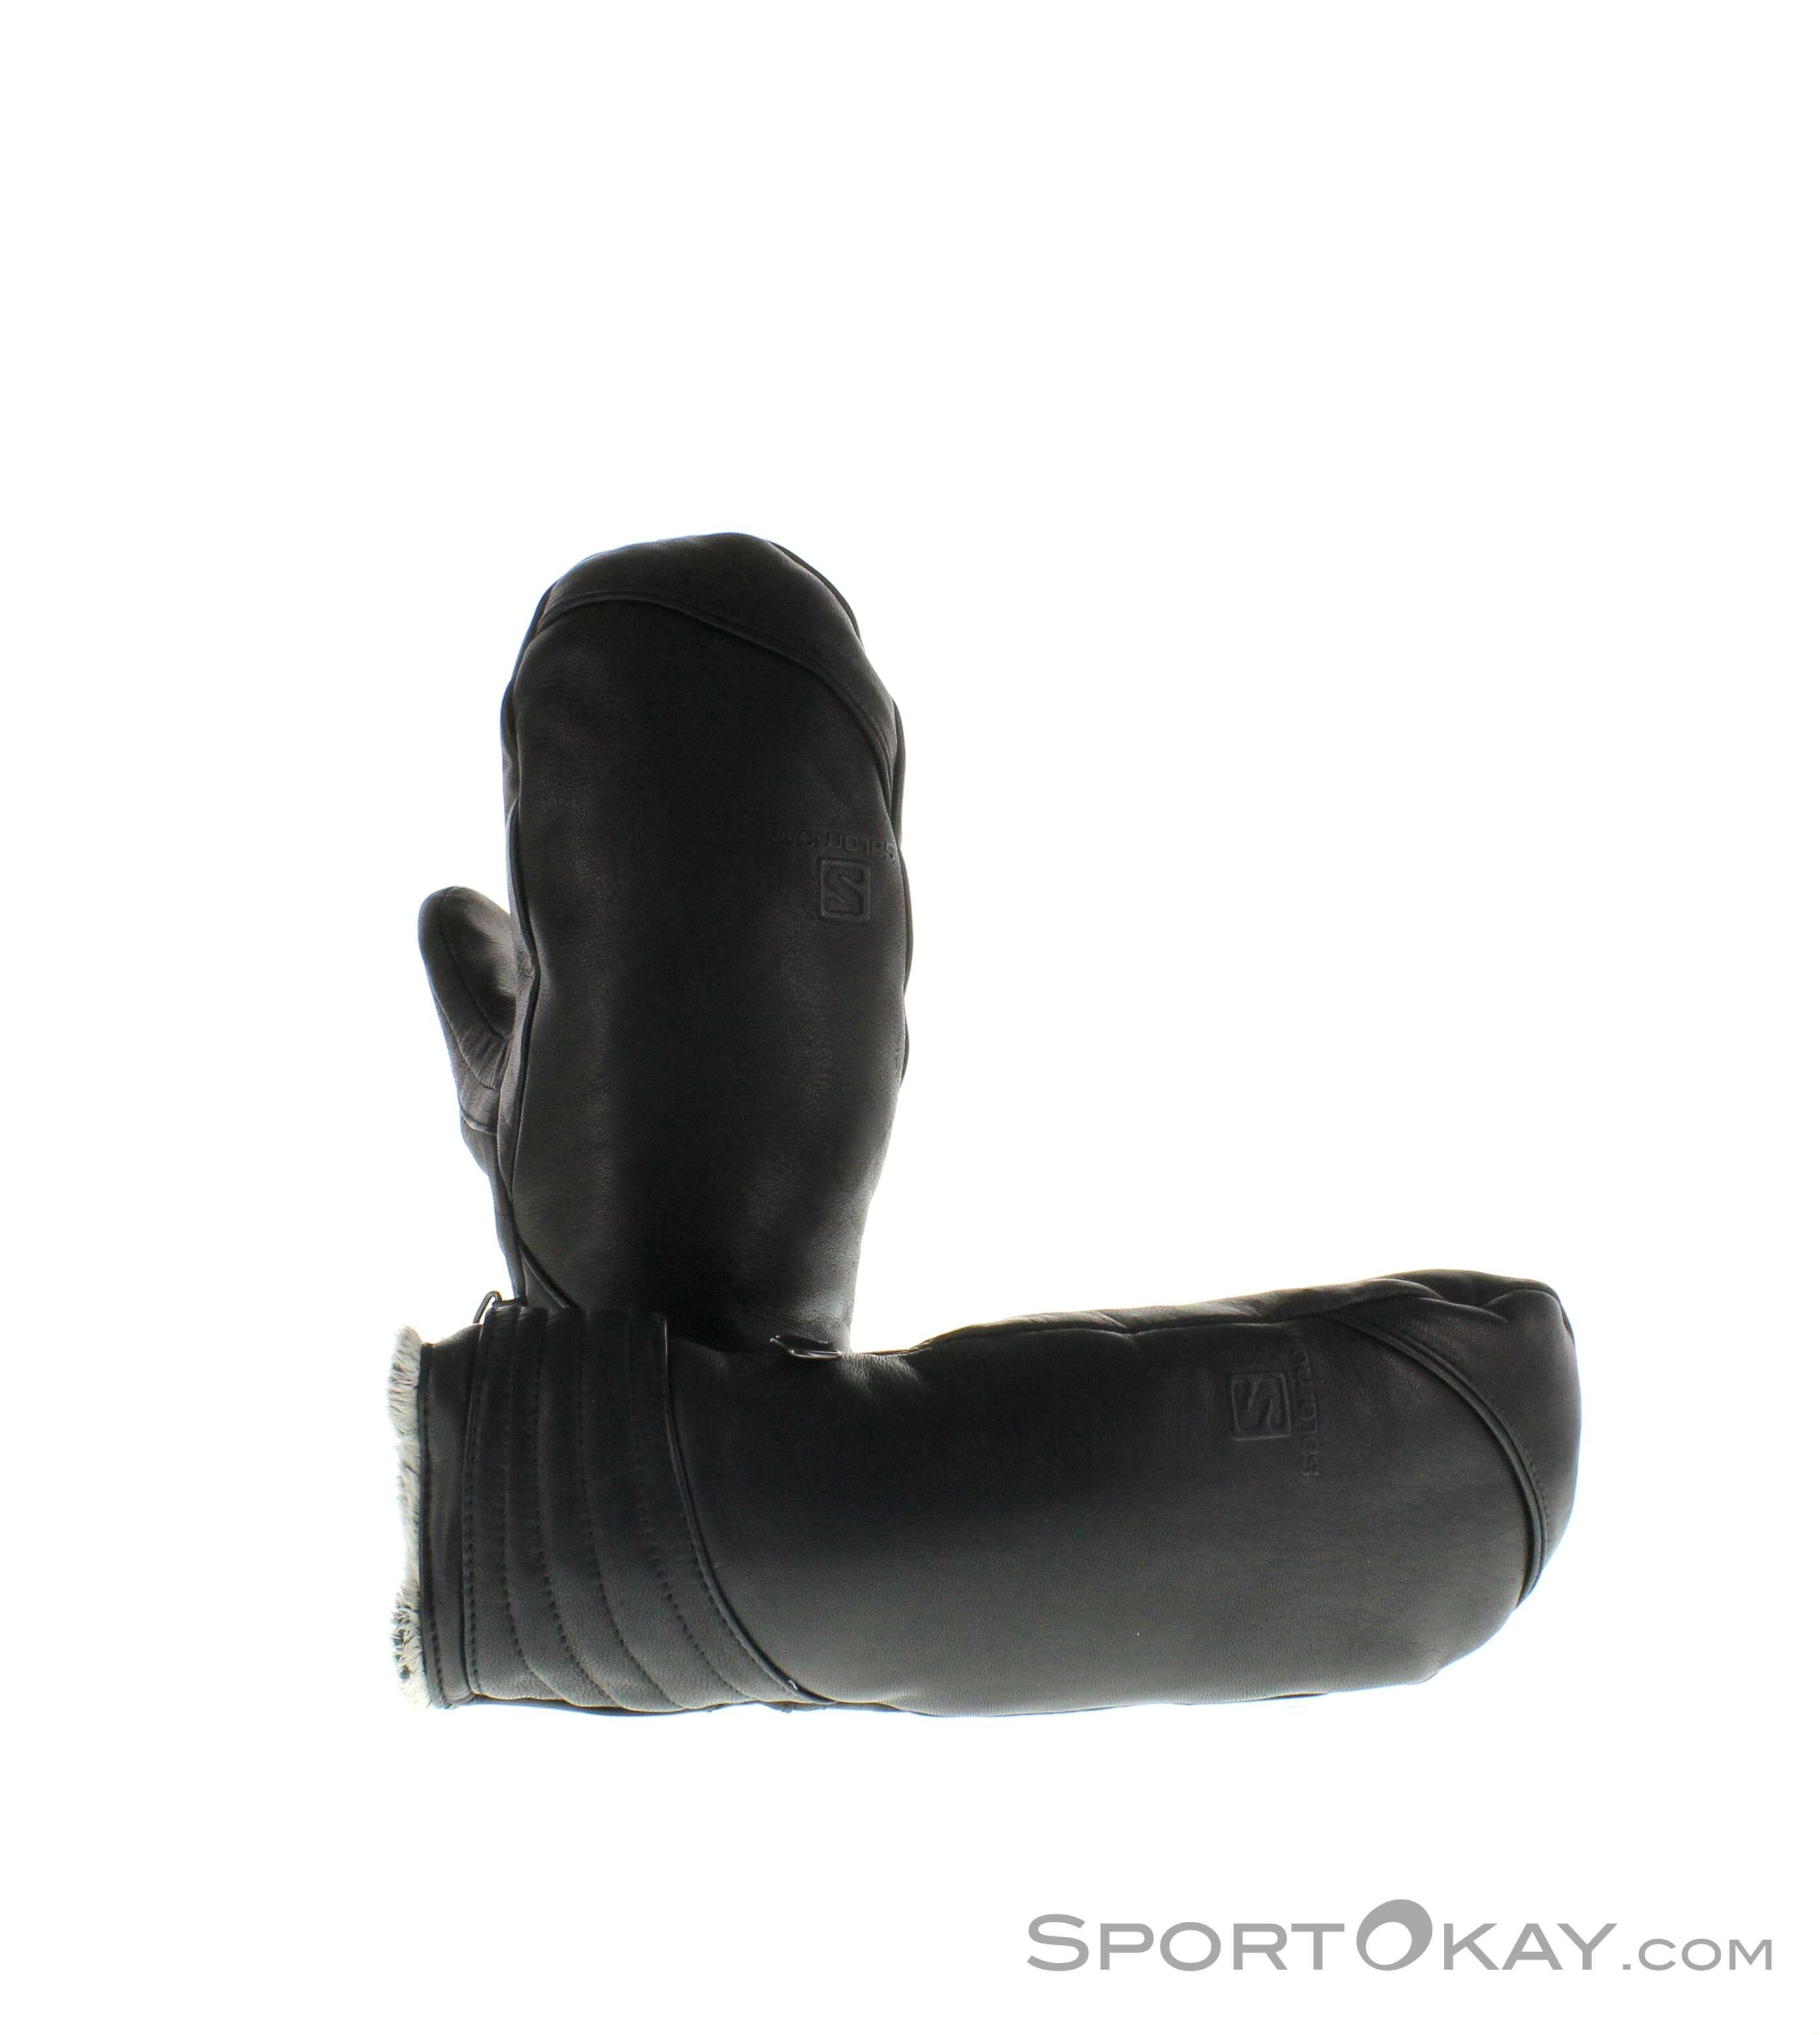 Salomon Native Mitten Damen Handschuhe-Schwarz-S